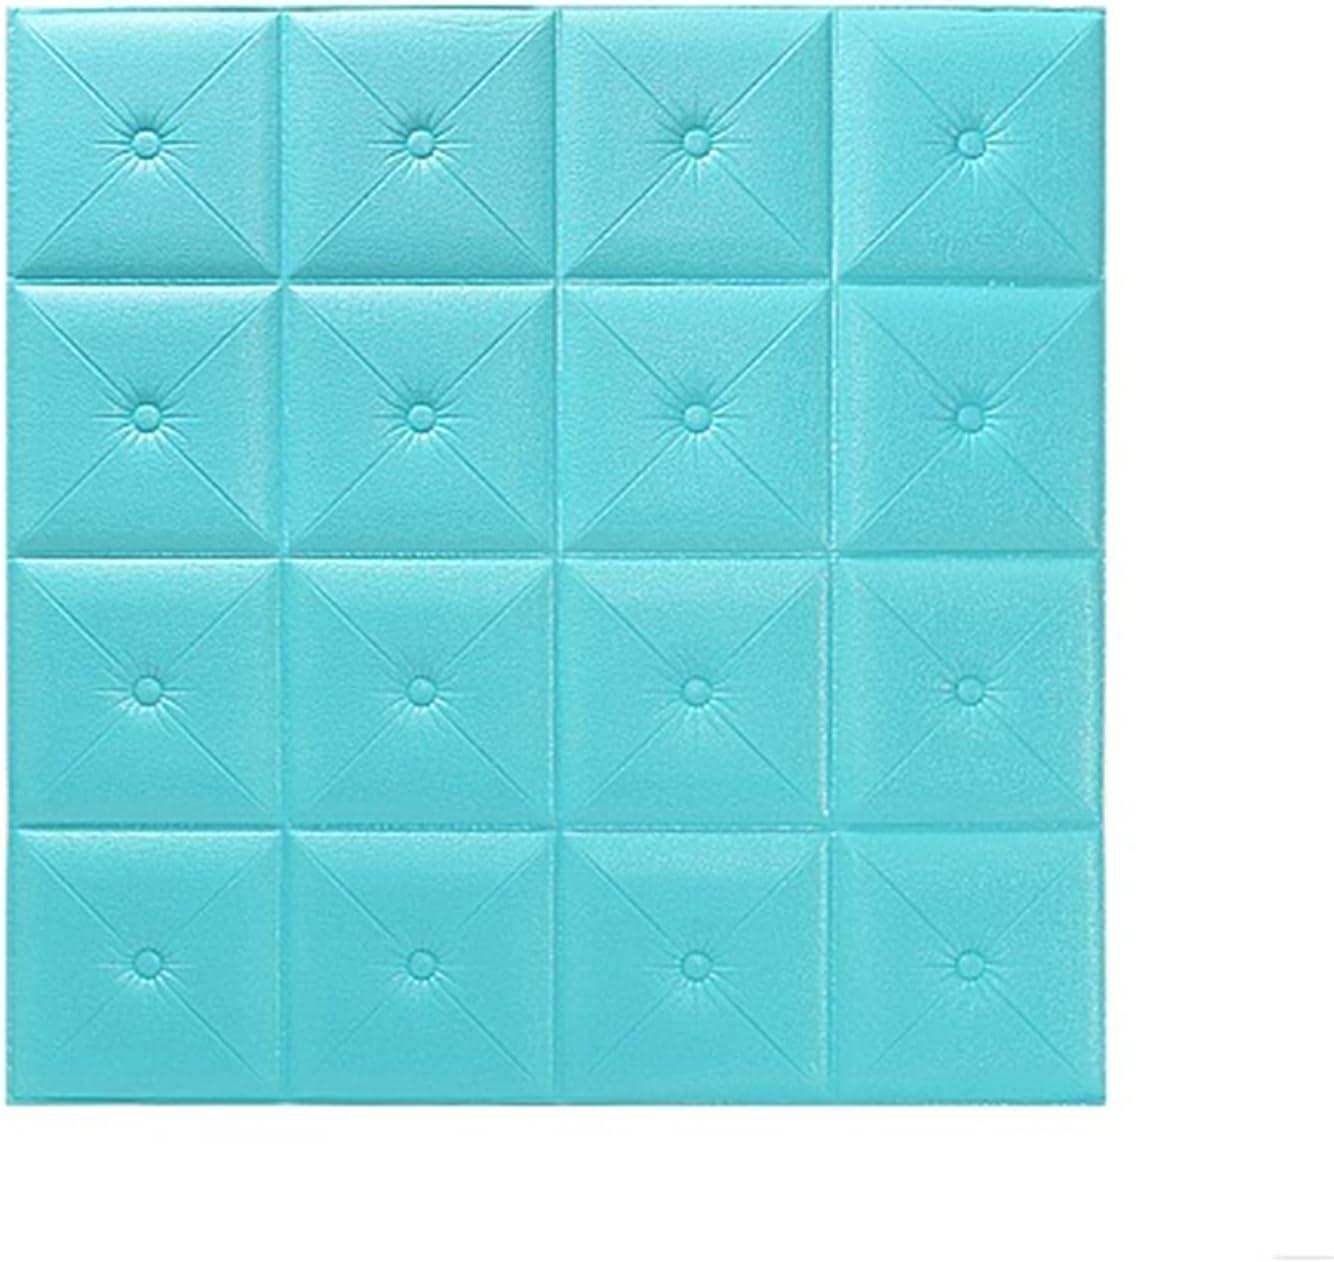 X-CWW Foam Brick Wall Super supreme beauty product restock quality top Panels Rainbow Self-A Stickers Colors